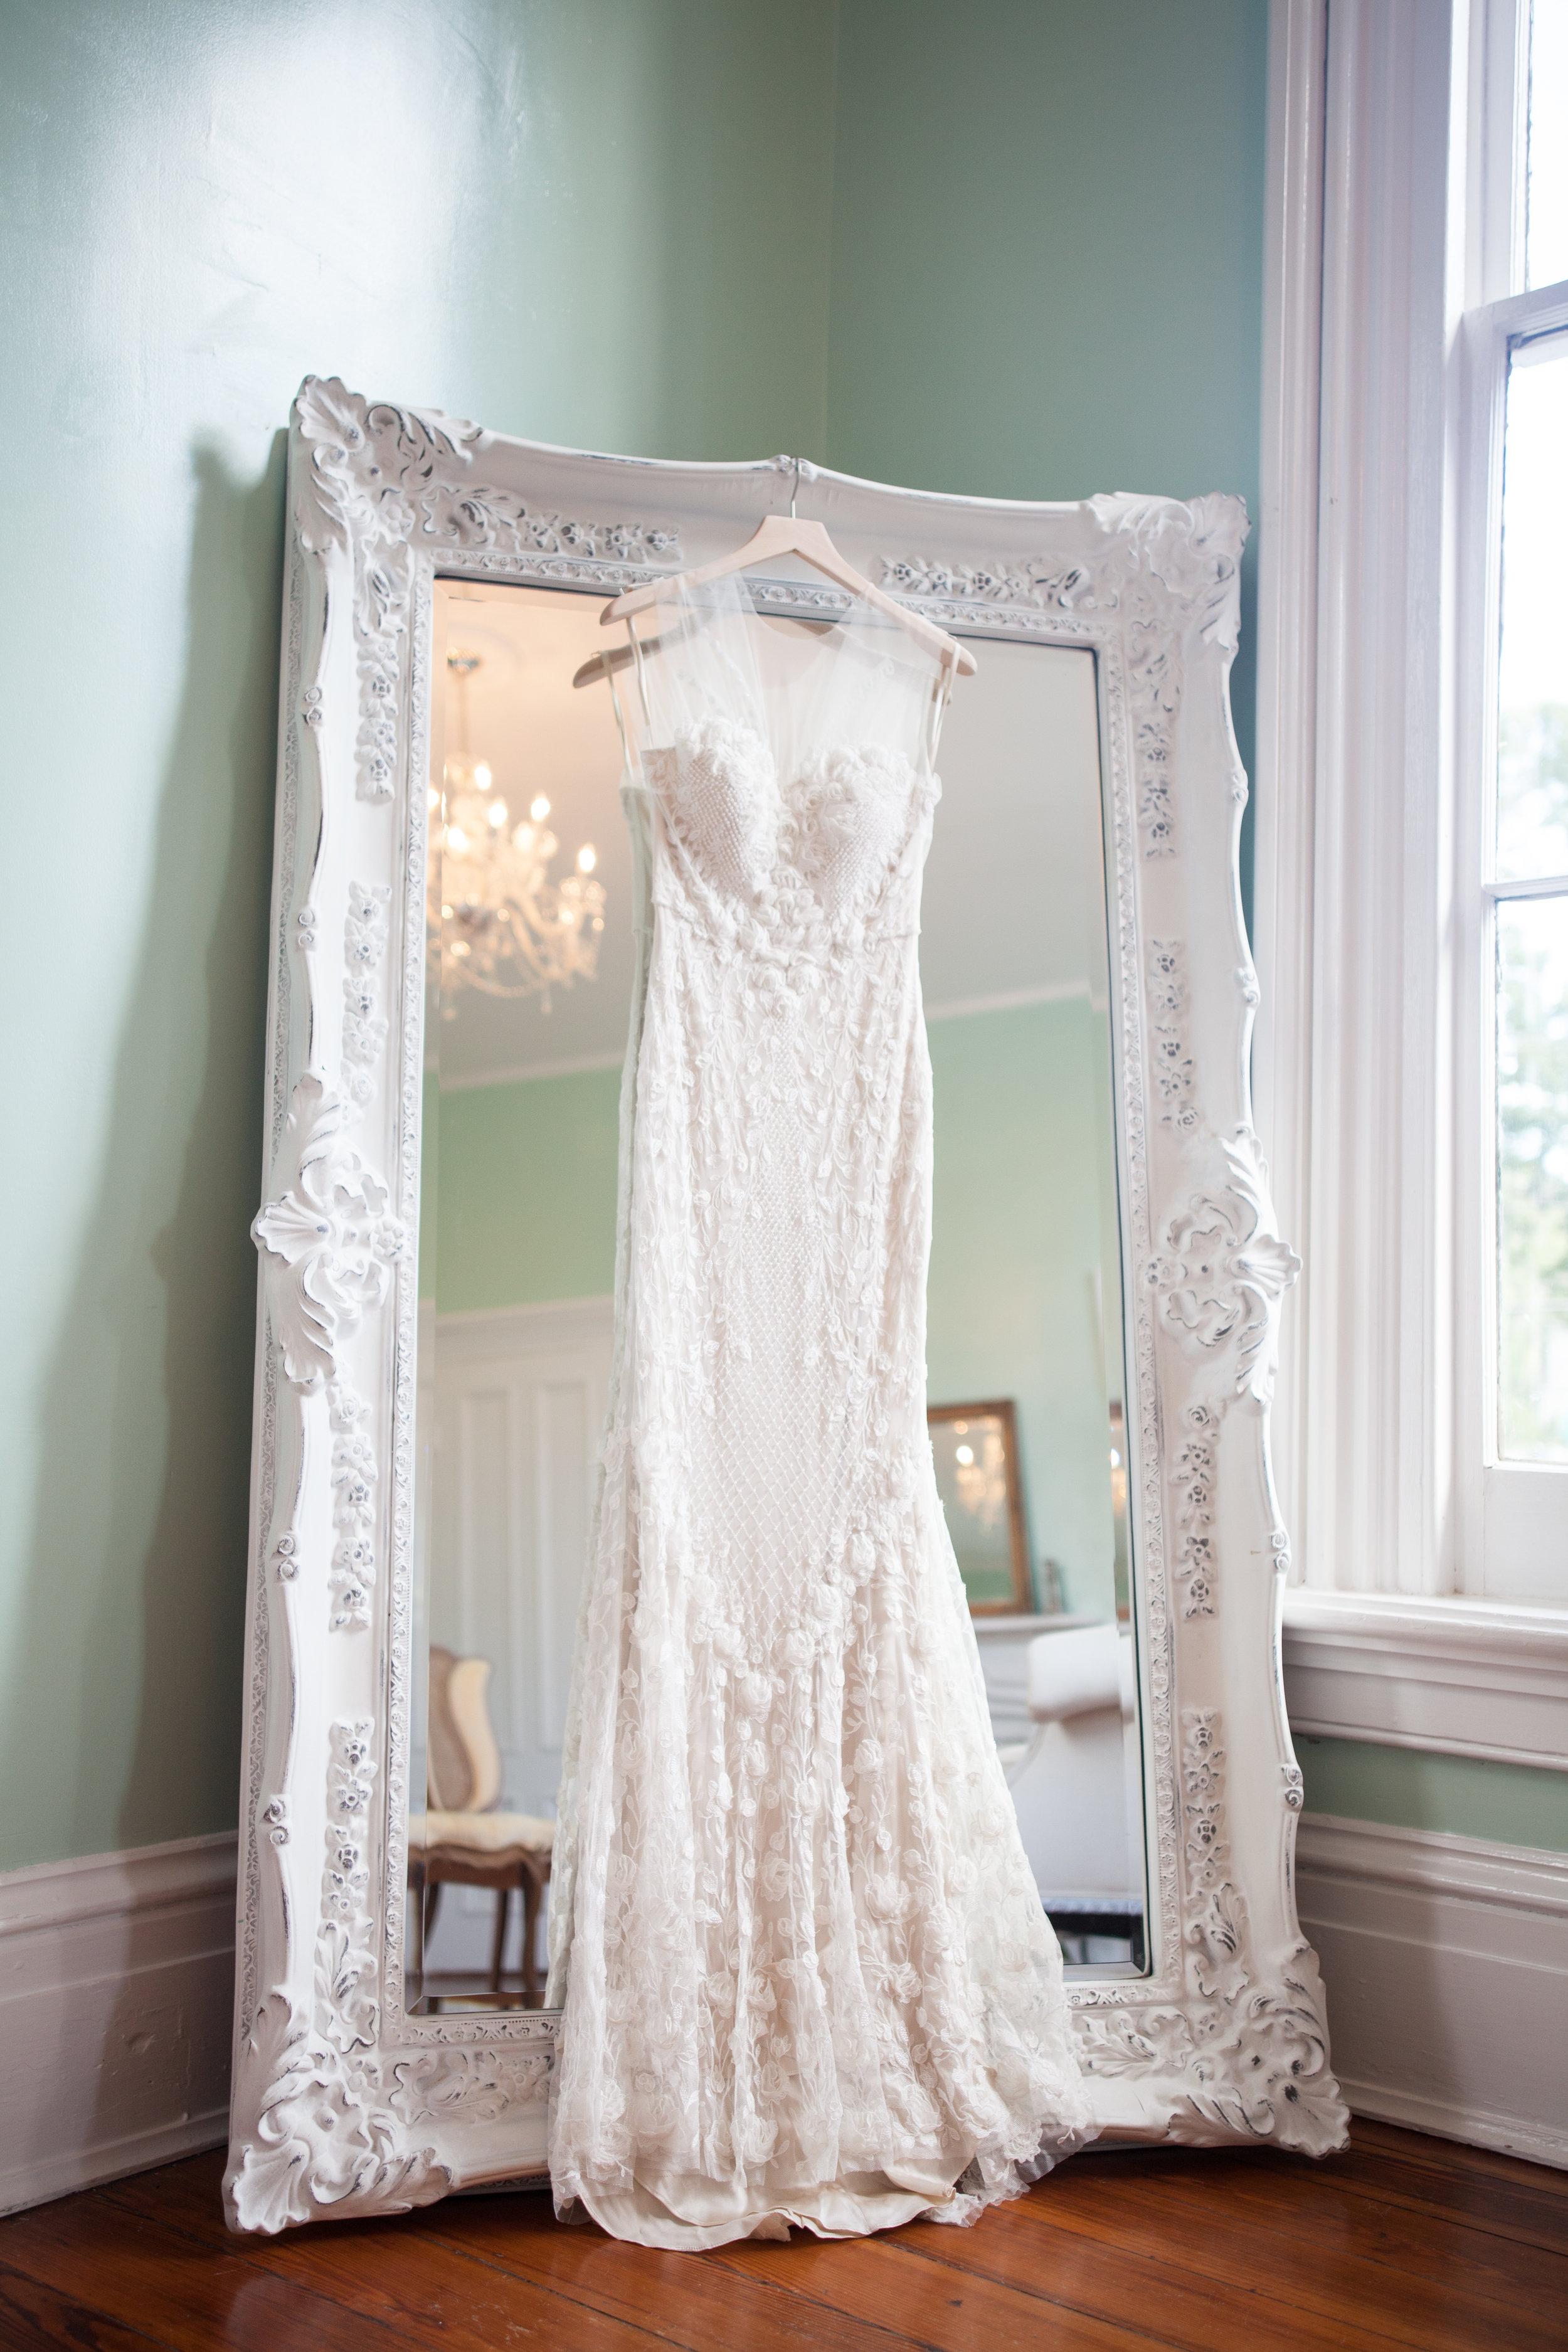 2016_08_20_rosalia_bill_wedding-2994.jpg